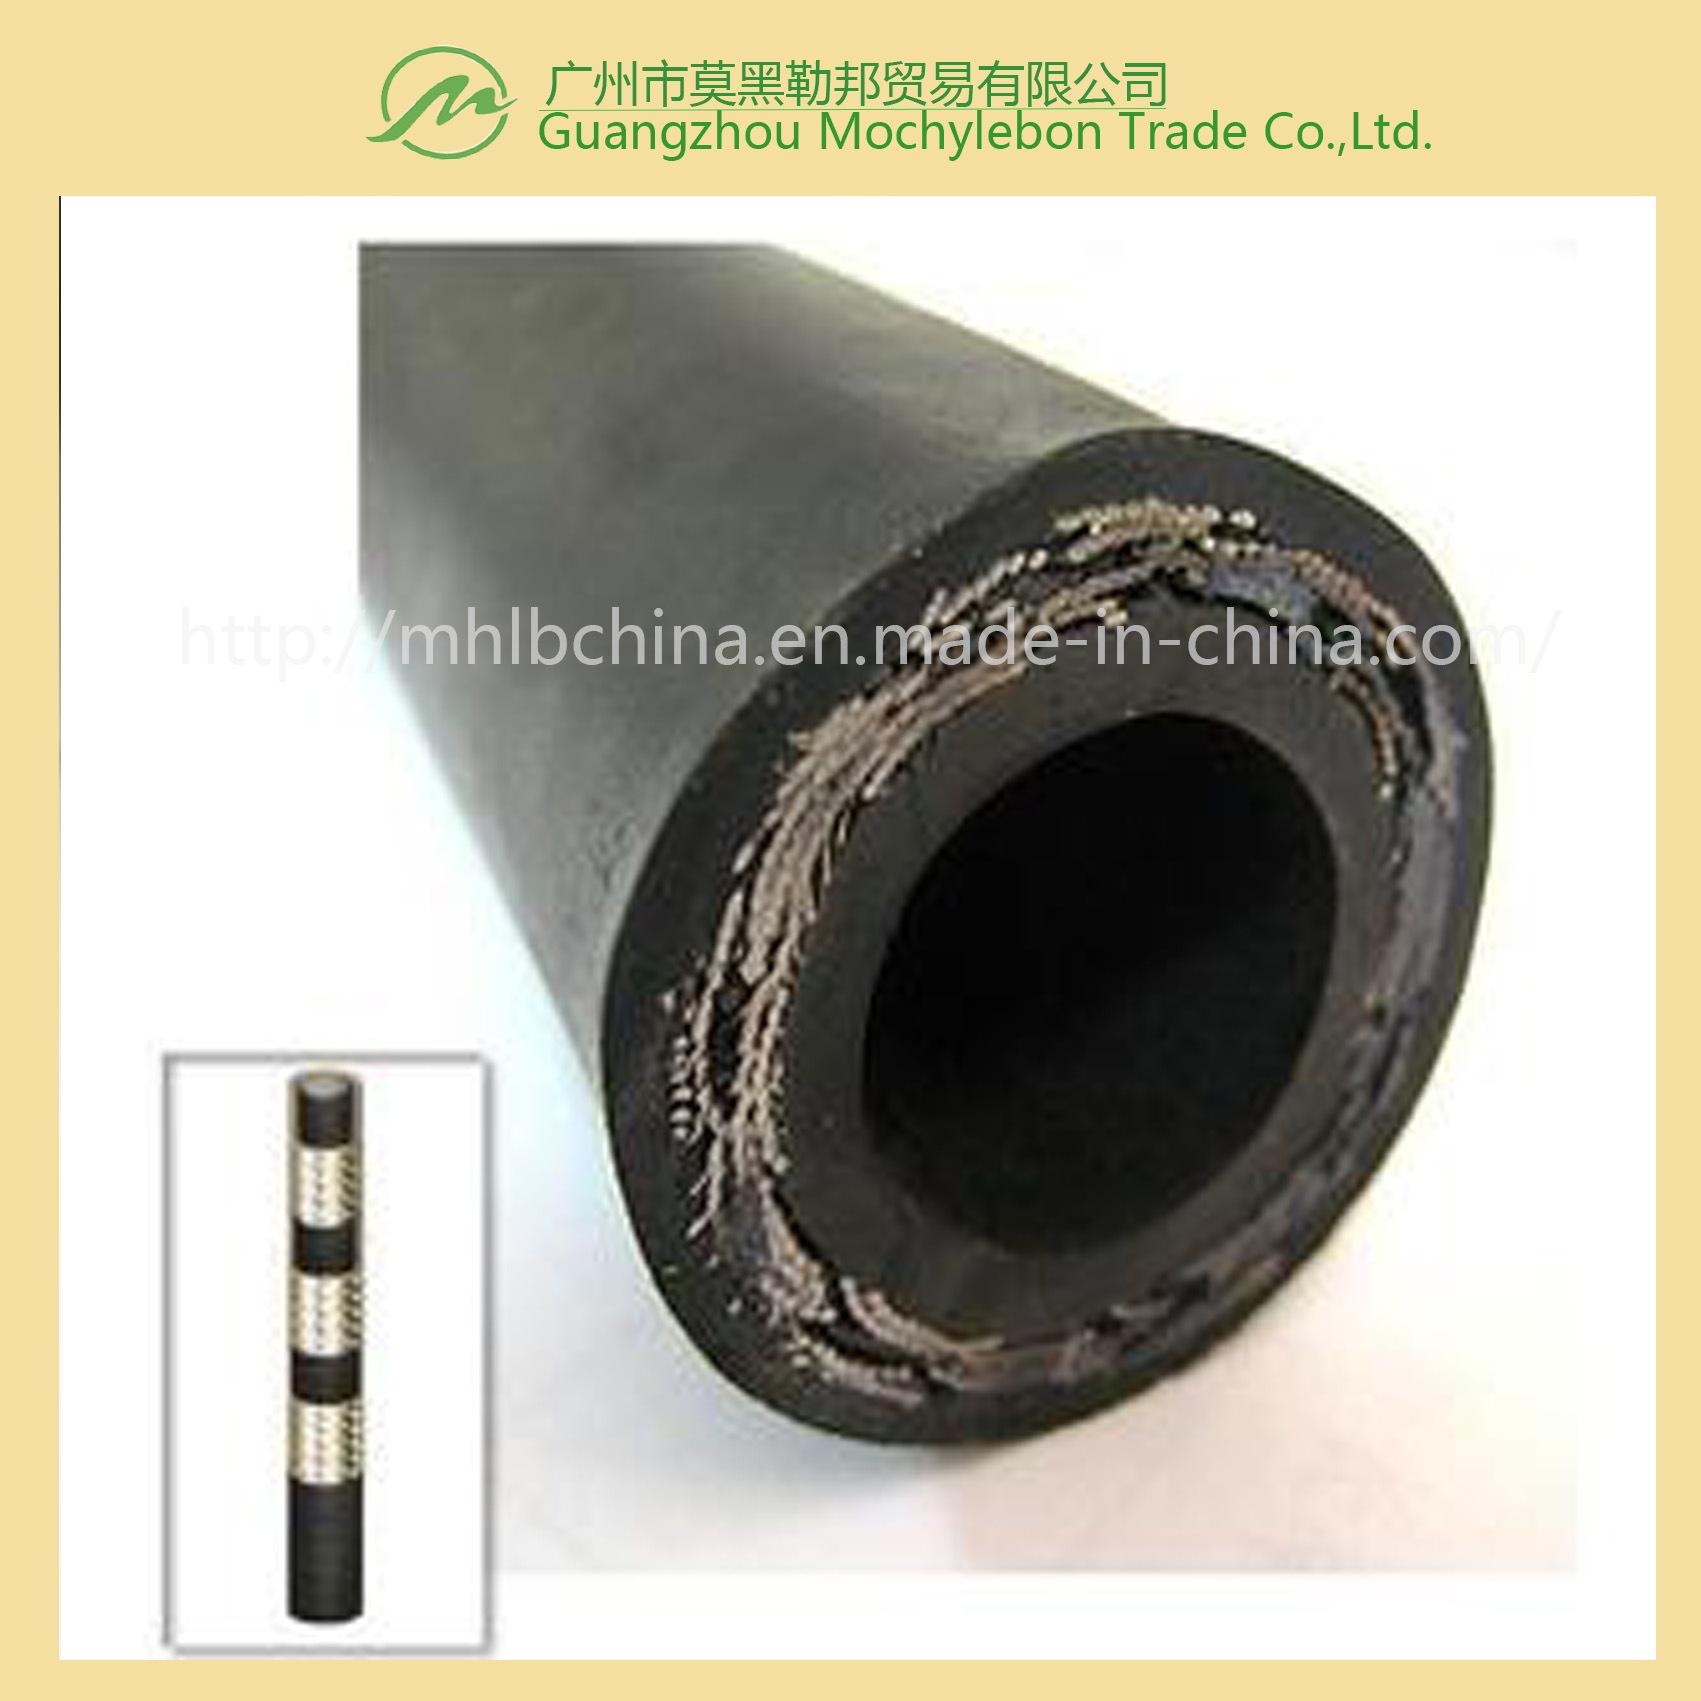 Wire Braided Hydraulic Hose for Coal Mine (602-3B-3/4)